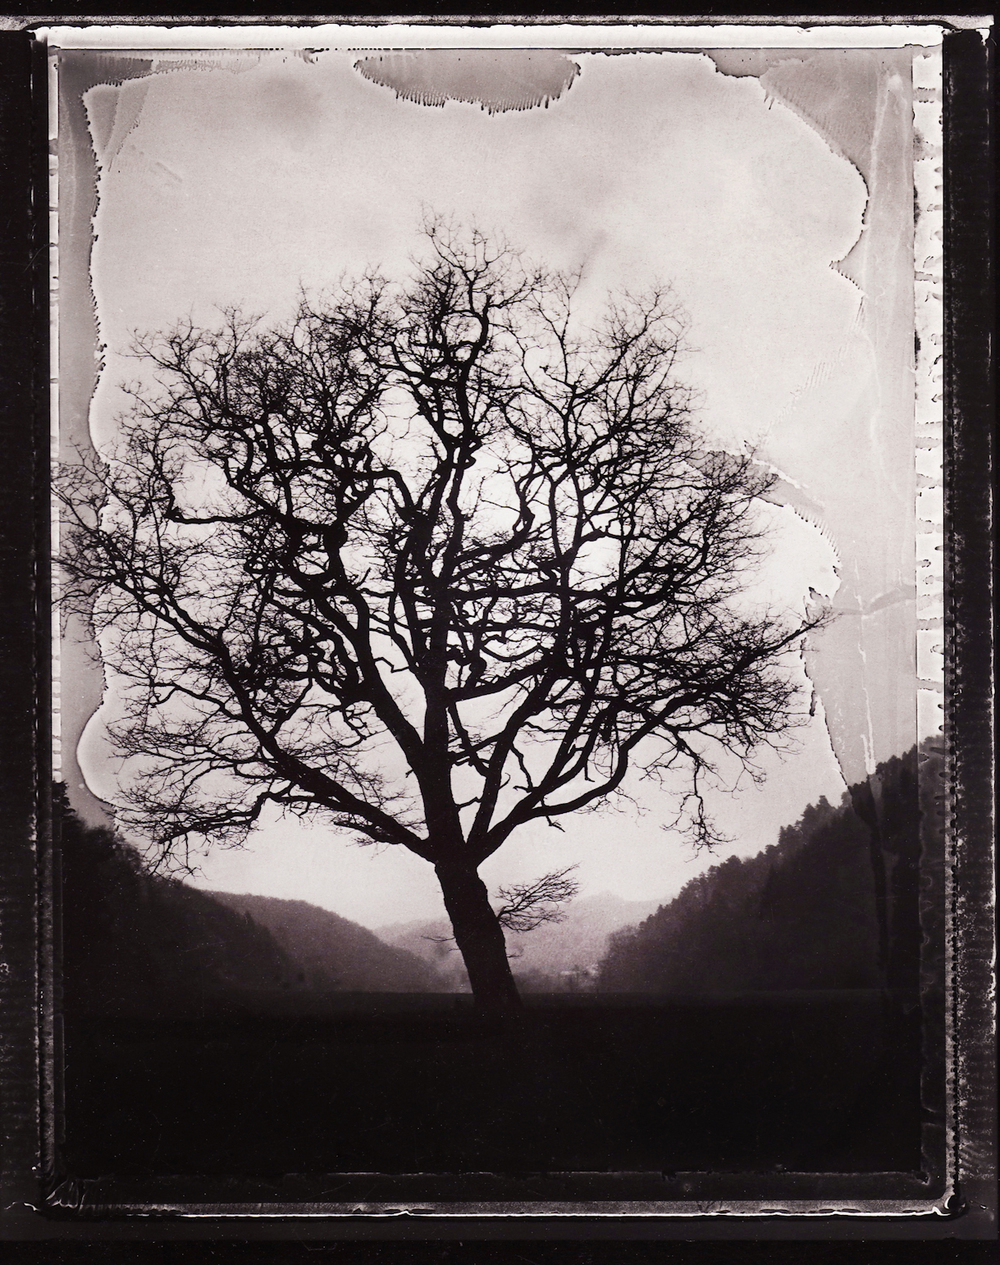 Pola-arbre 14.jpg